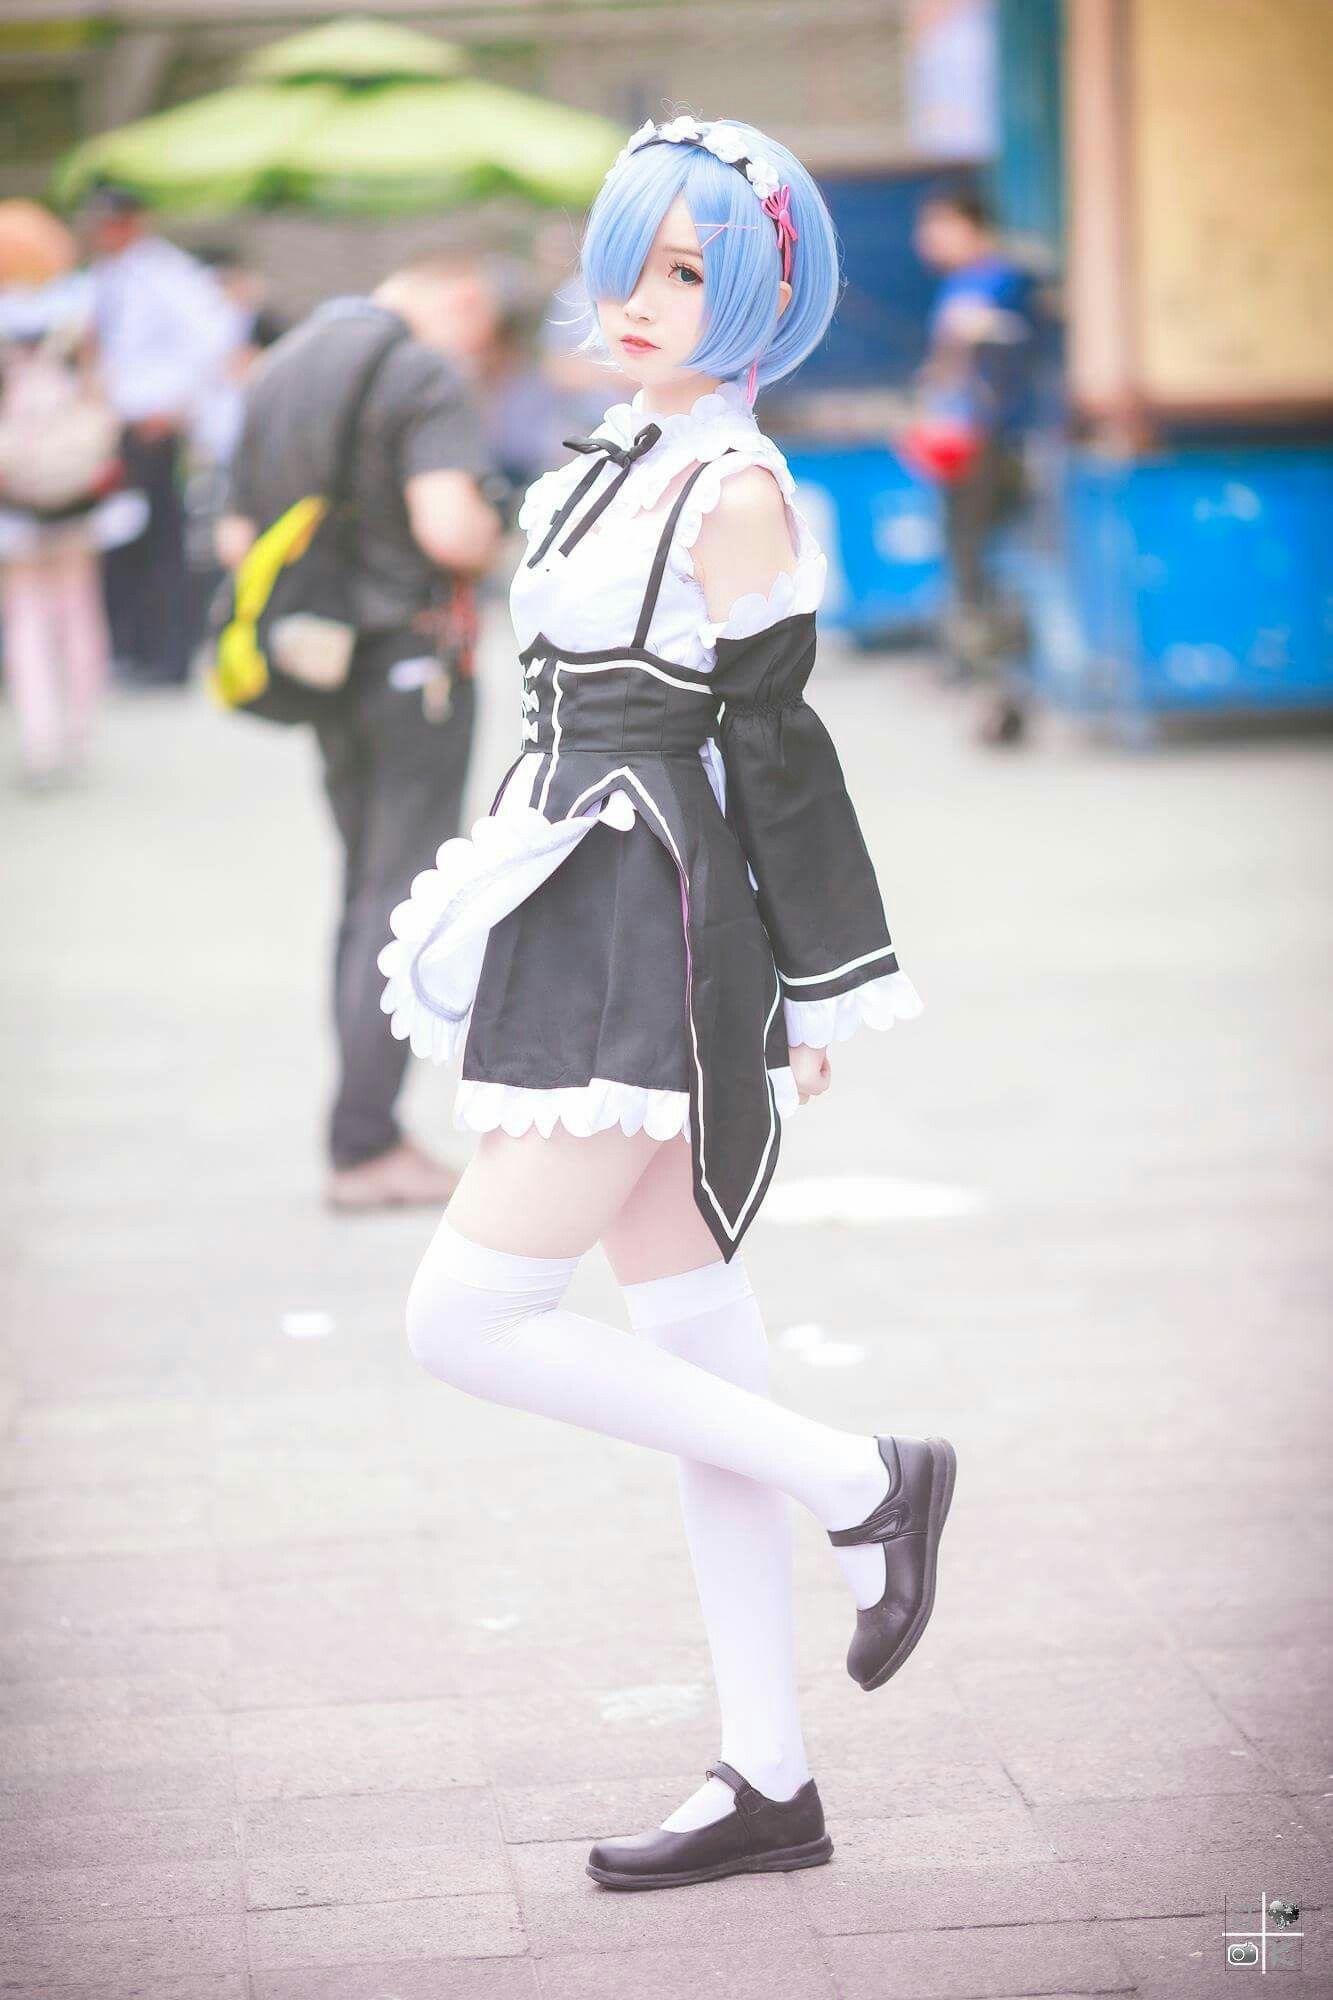 re zero rem cosplay cute maid | Cosplay World | Pinterest ...